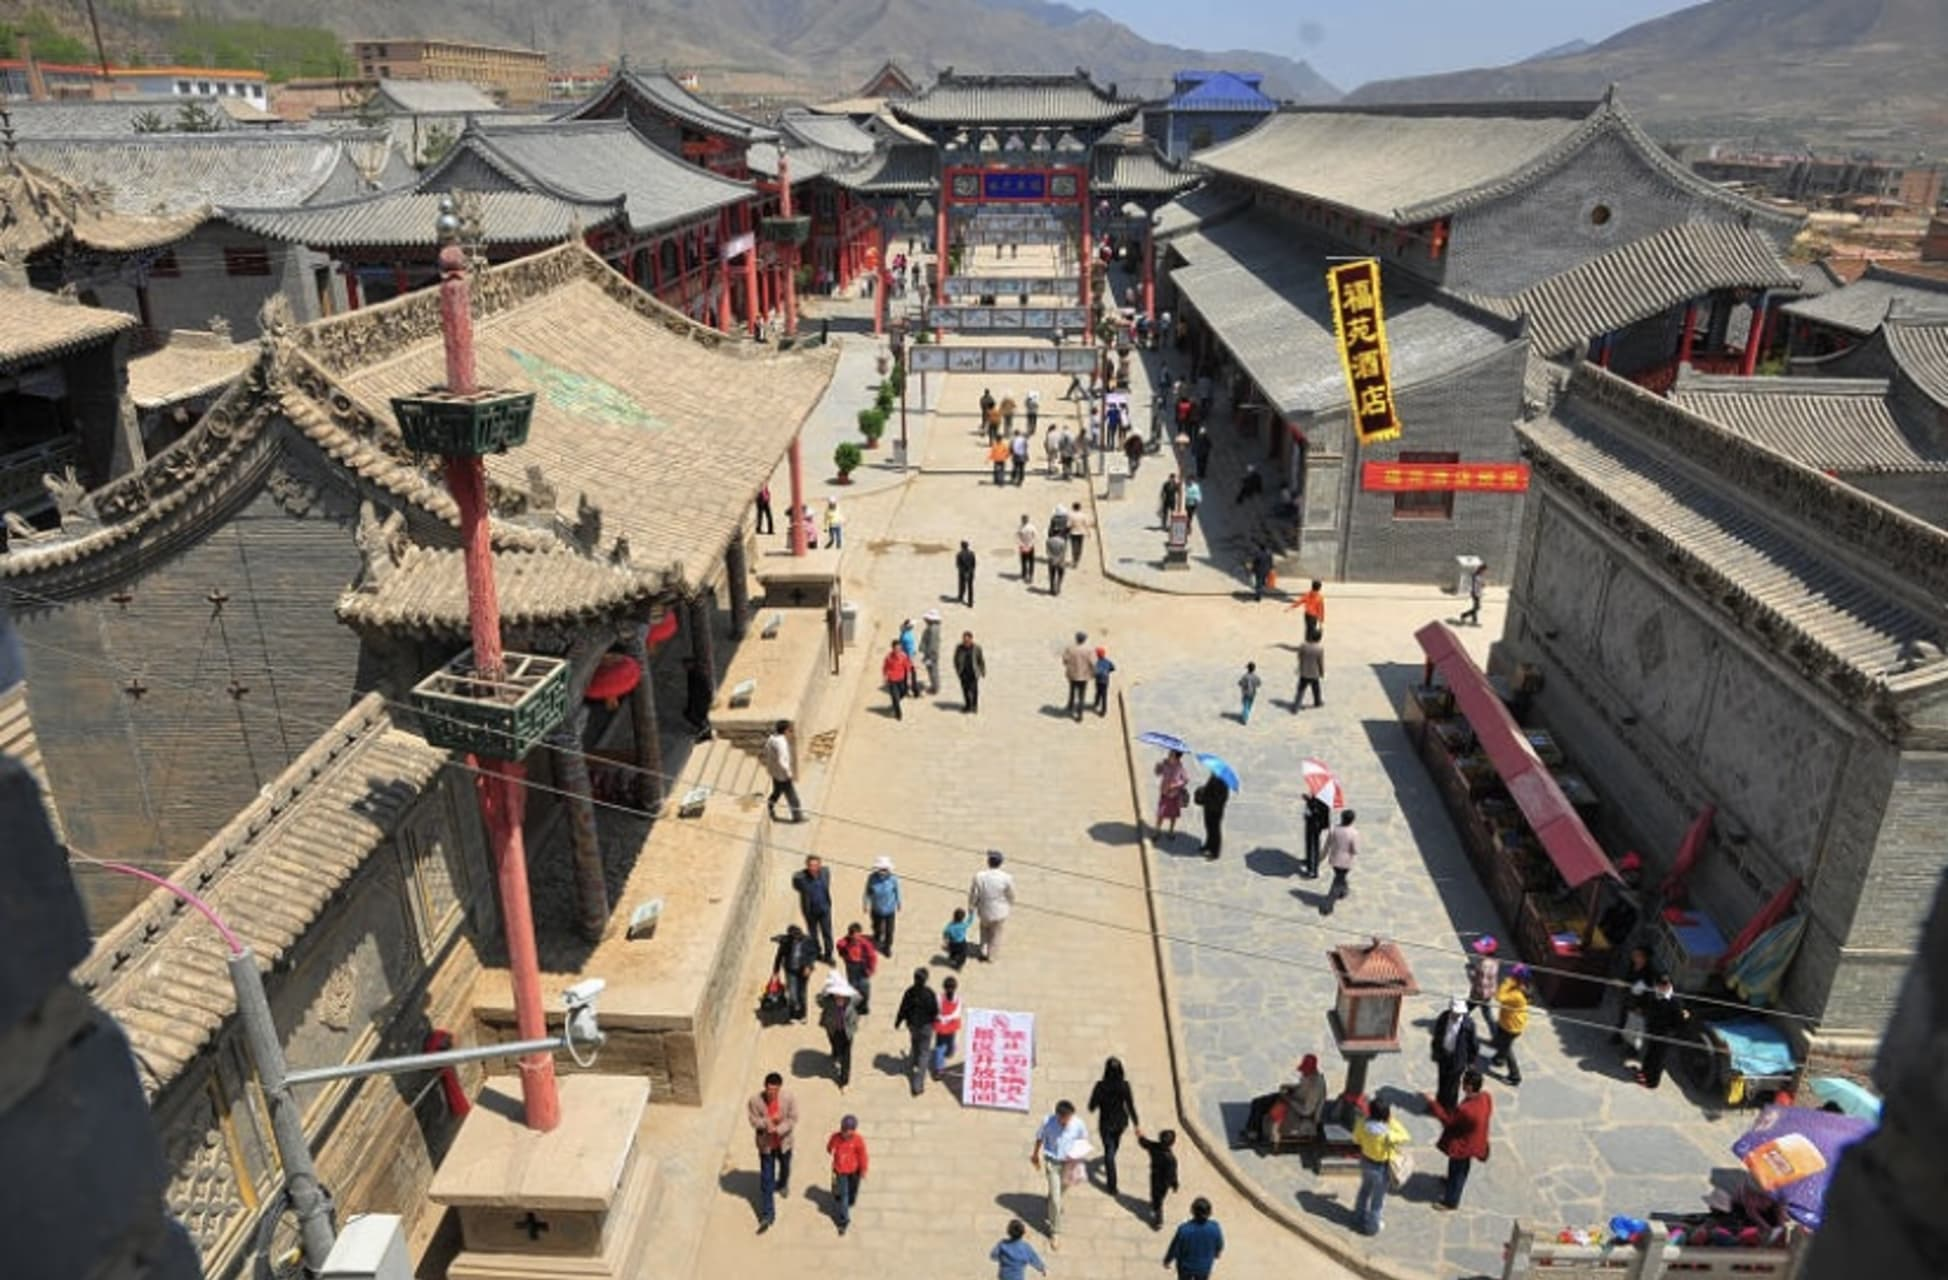 Hexi Corridor (China's Silk Road) - Huangyuan Danga'er: Ancient Silk Road Trading City